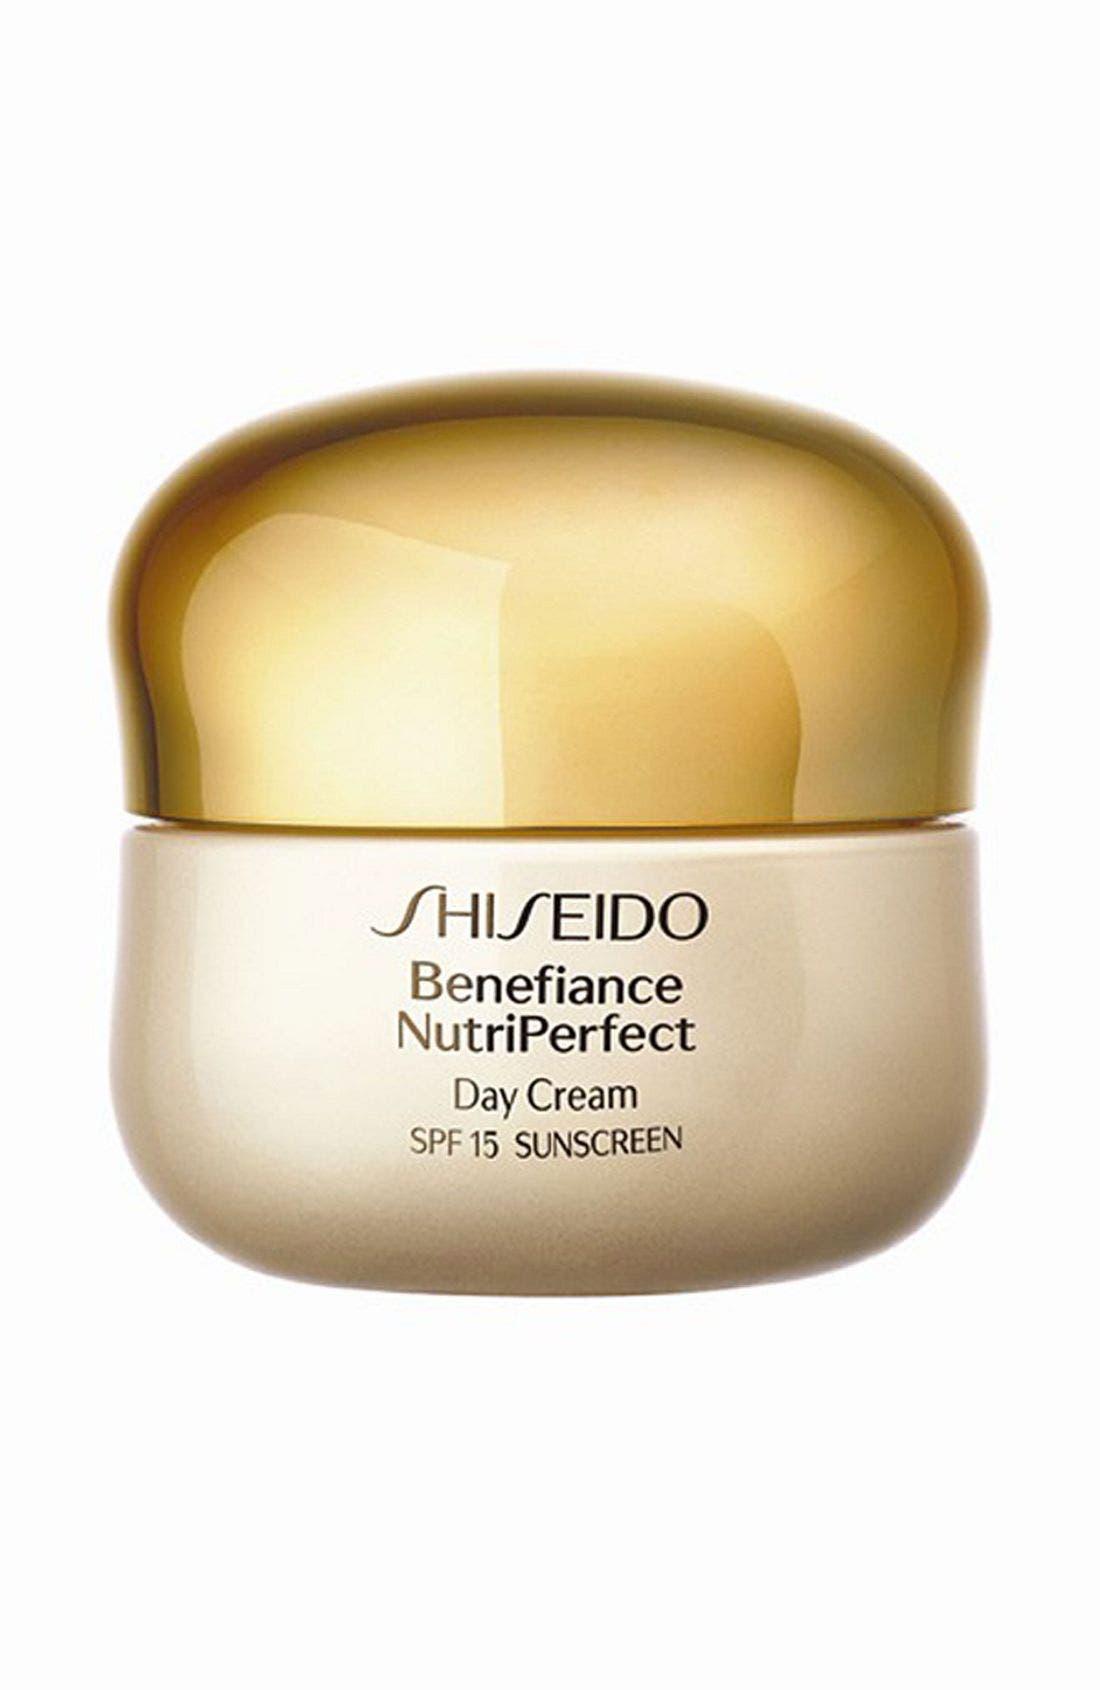 Shiseido 'Benefiance NutriPerfect' Day Cream Broad Spectrum SPF 15